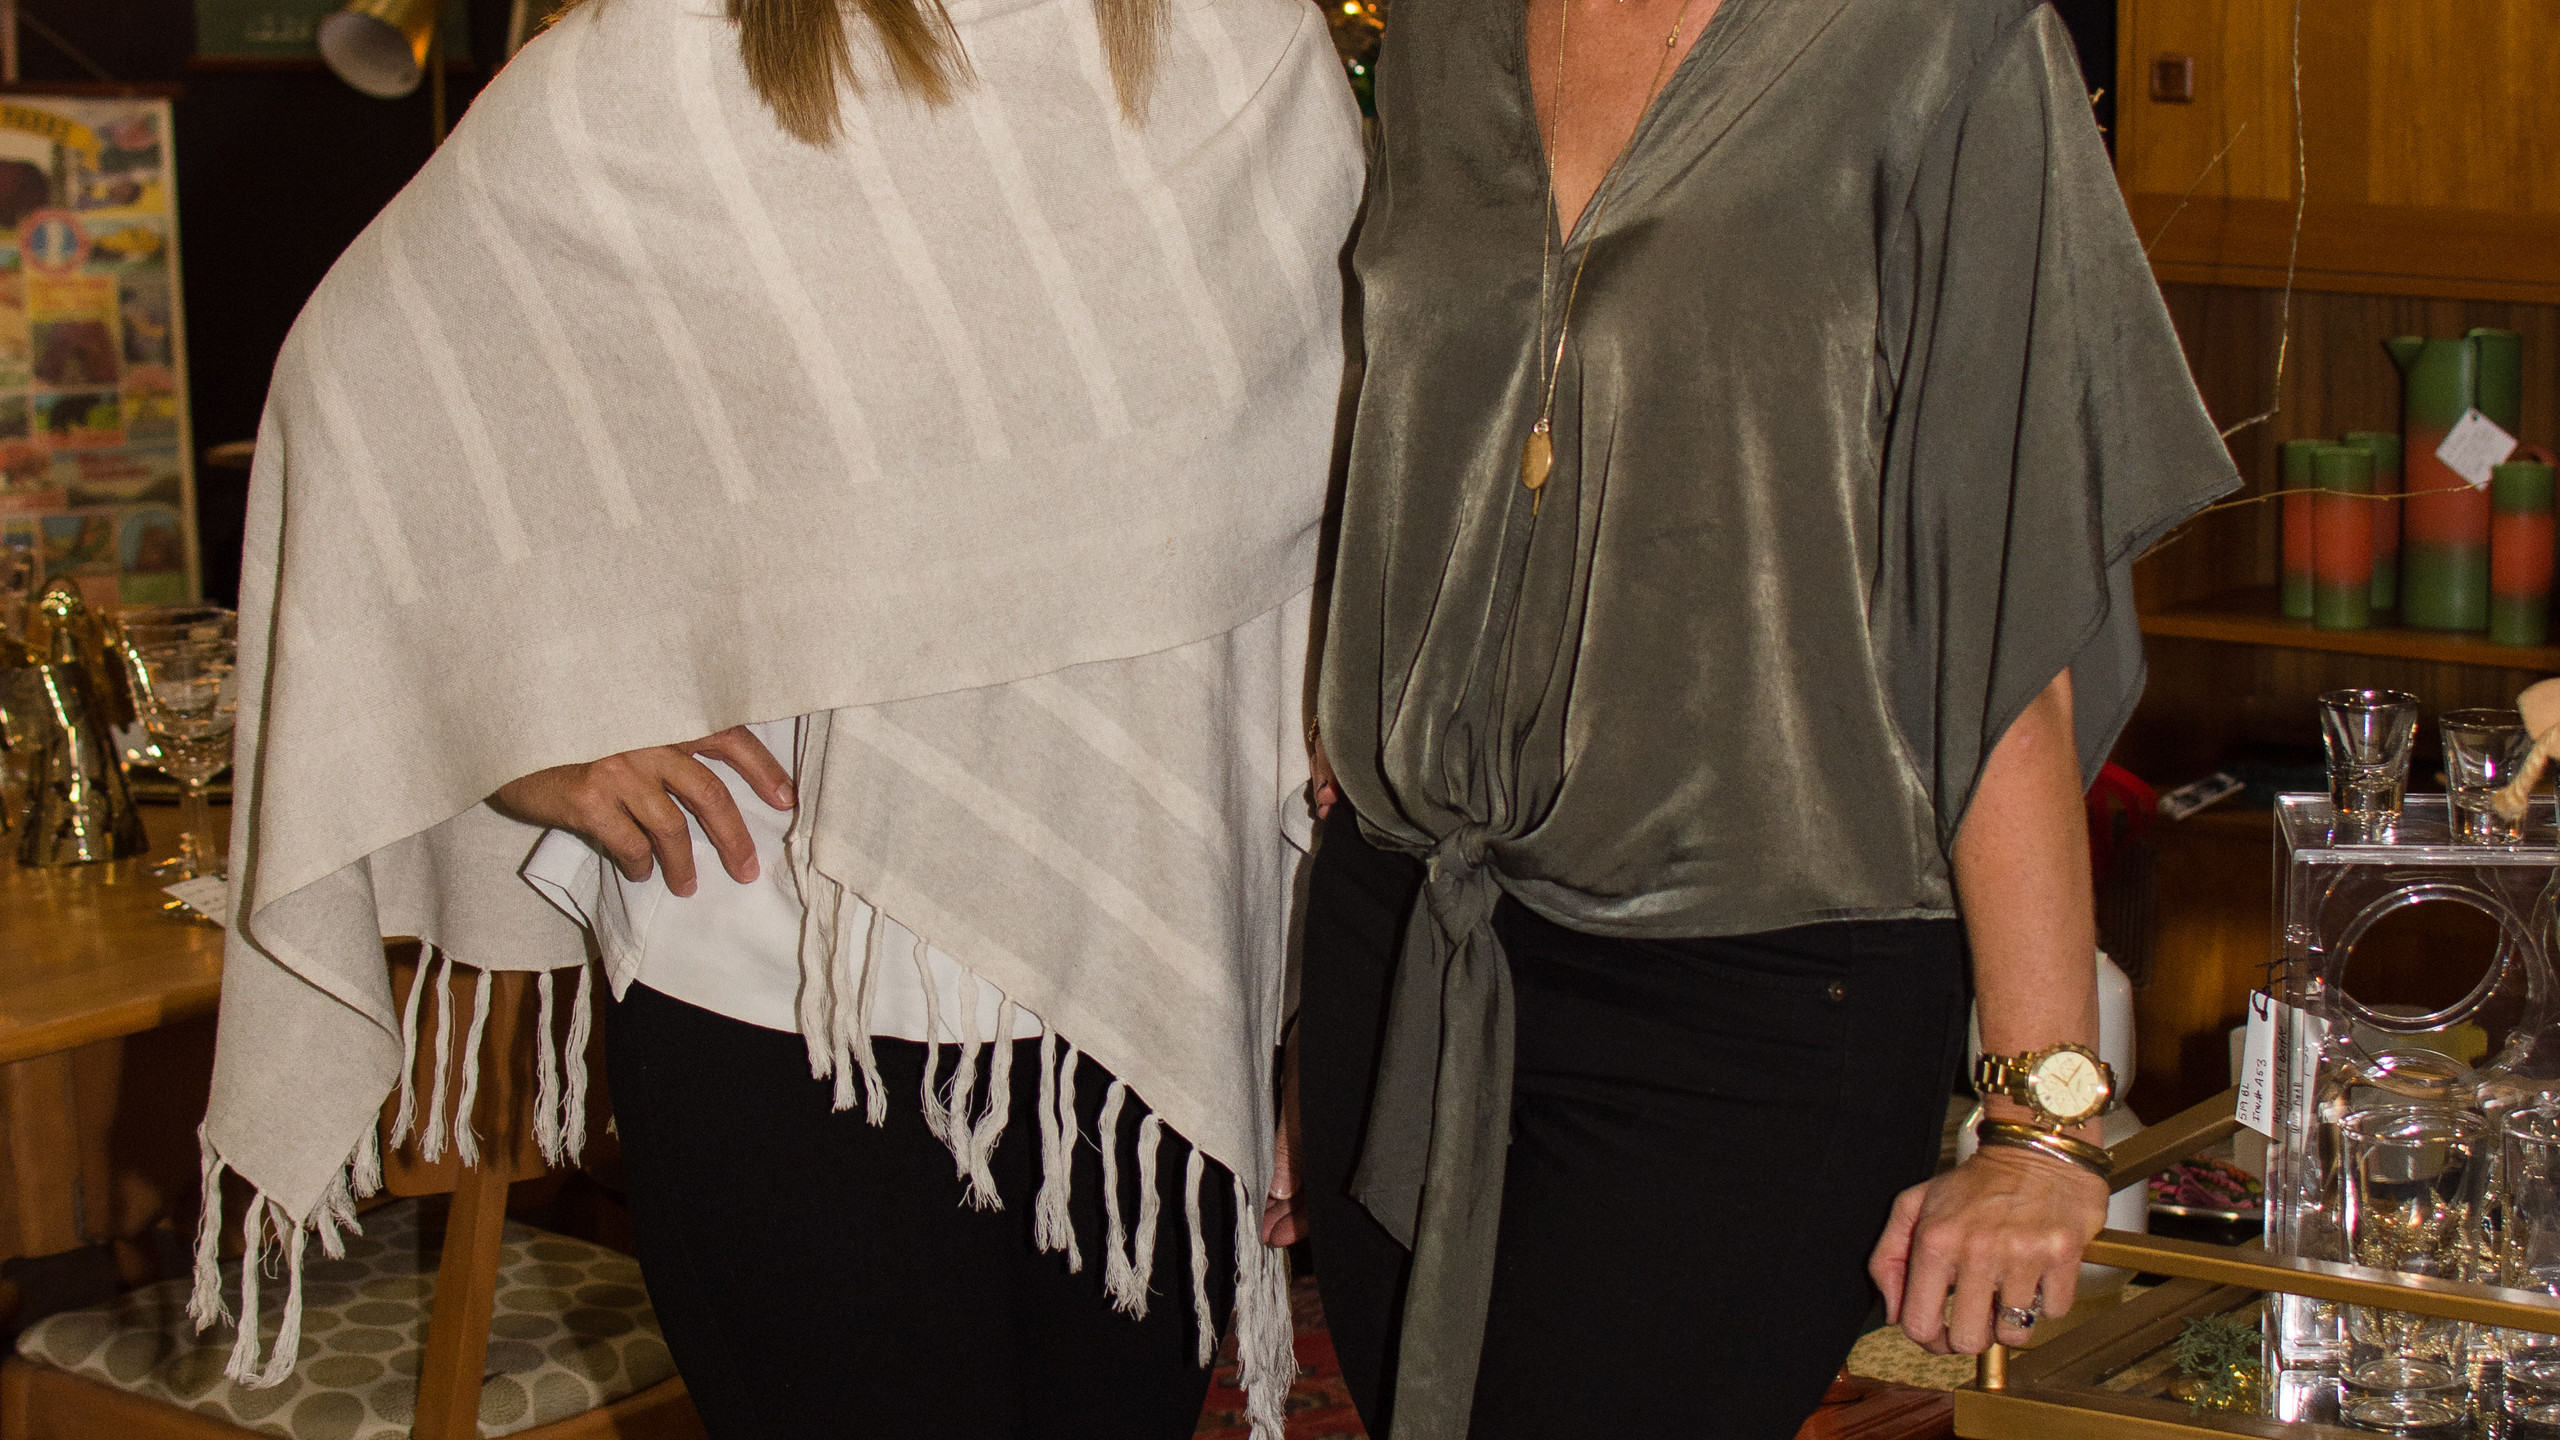 Linda Kautz and Beth Humphries